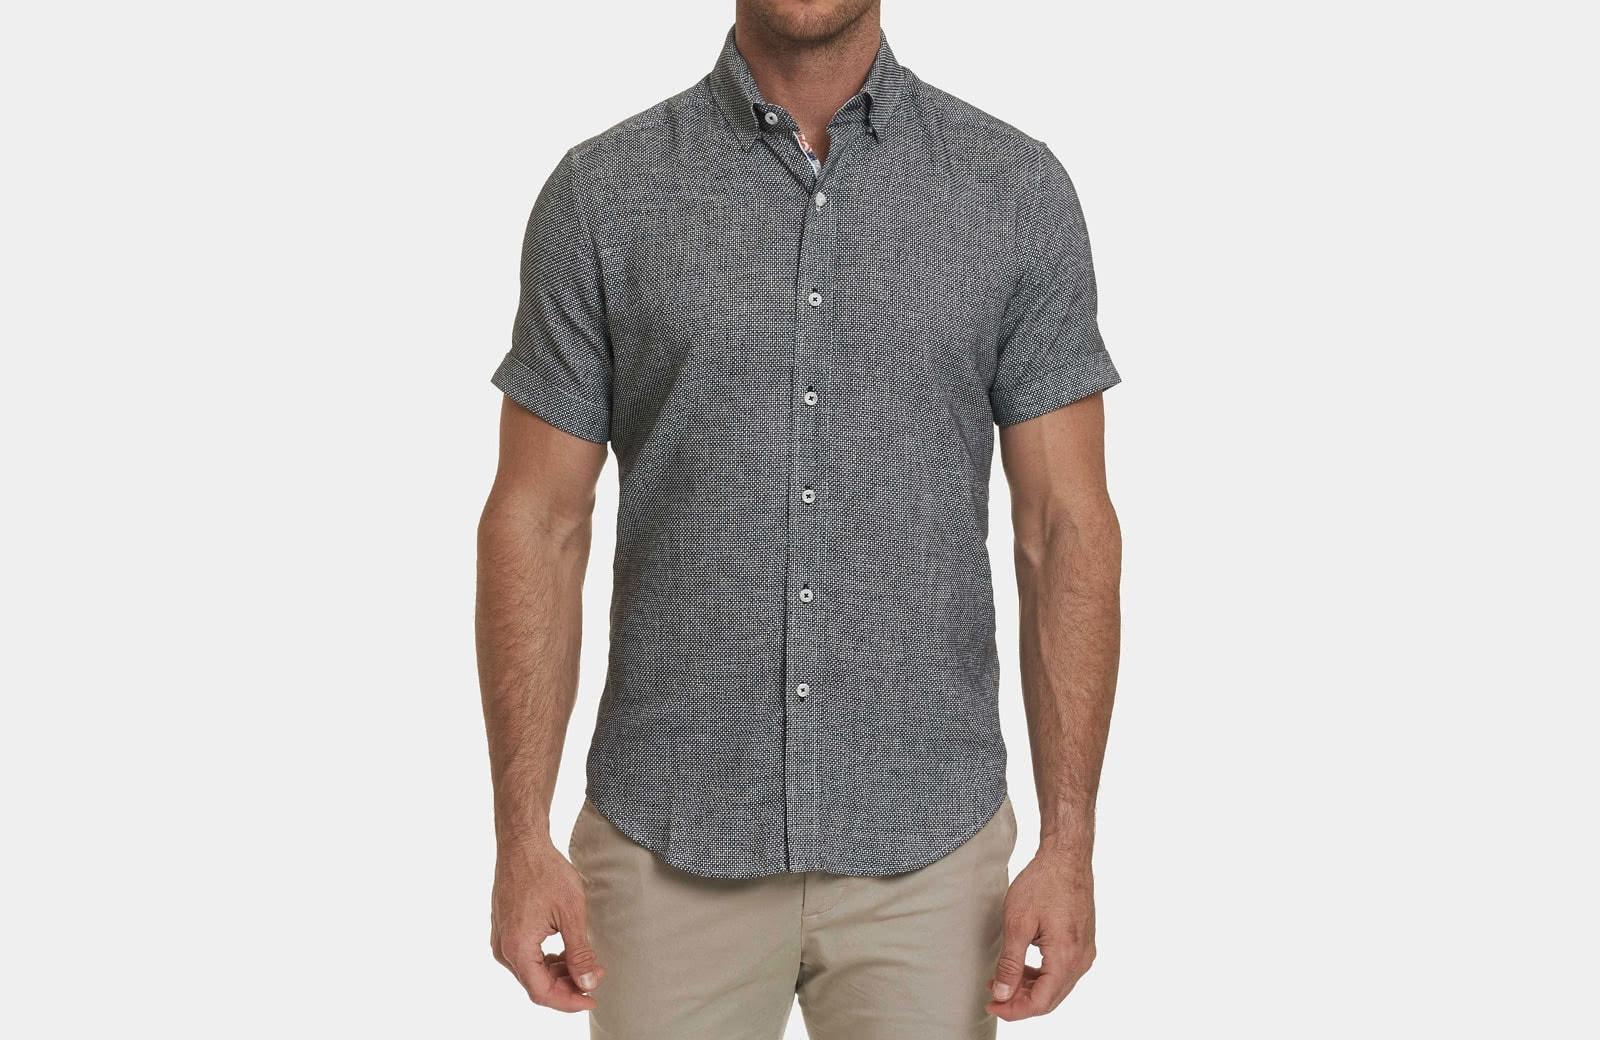 Robert Graham best men summer designer short sleeve shirt black - Luxe Digital